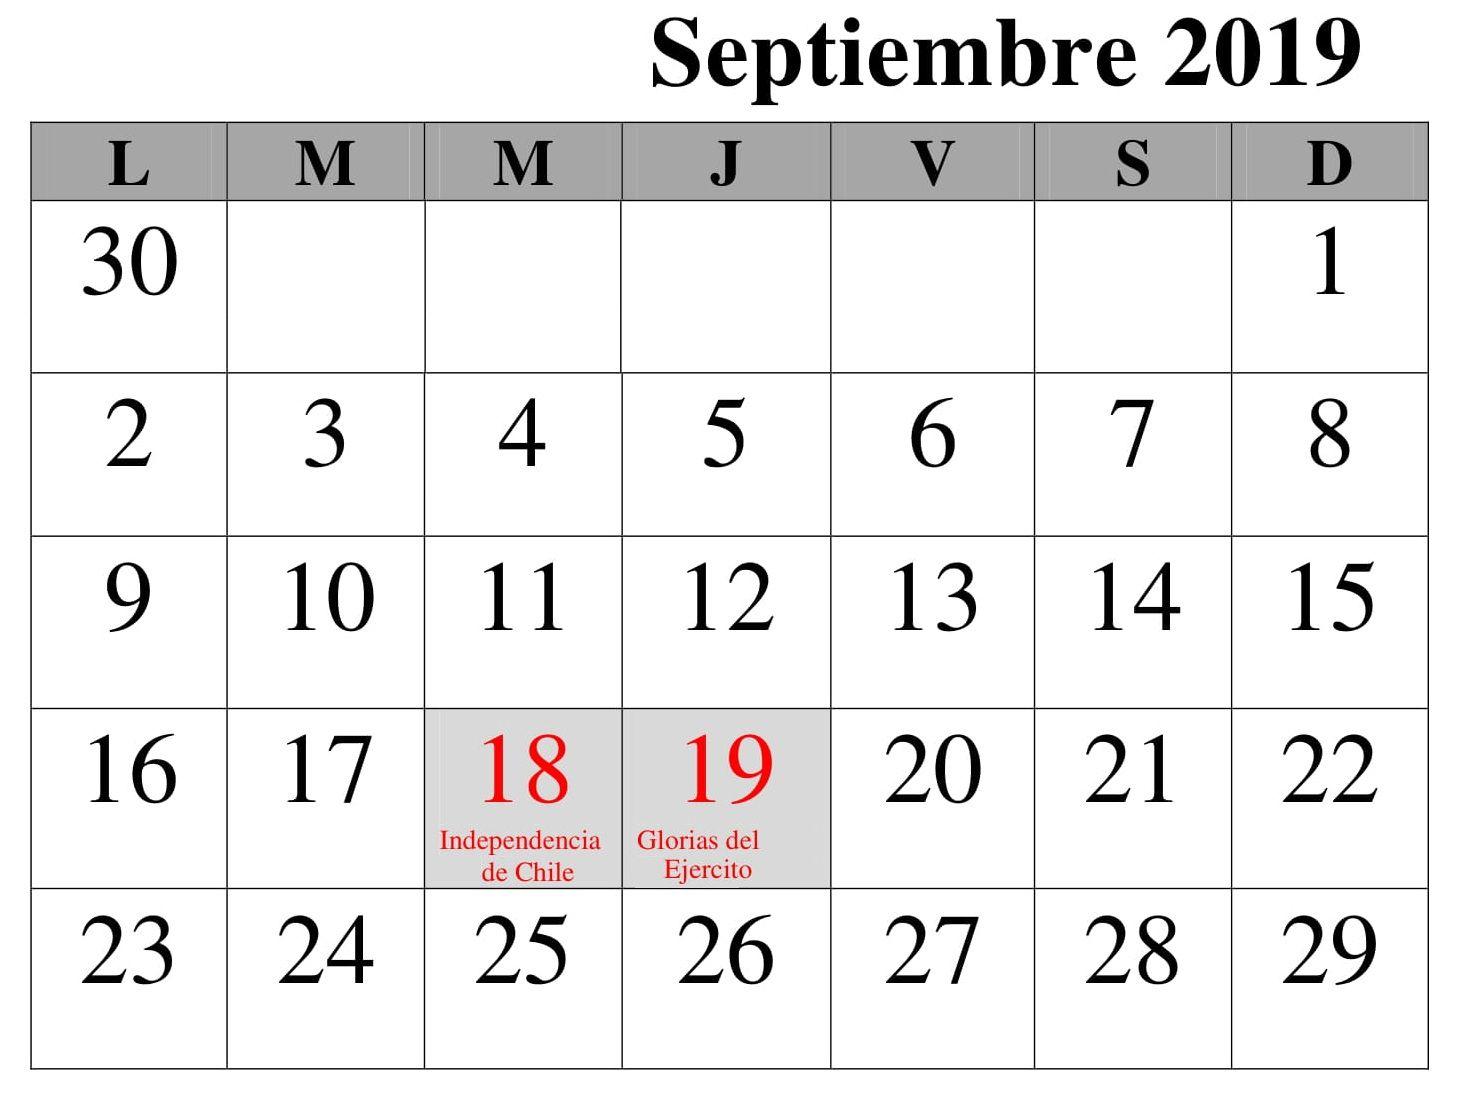 Calendario 2019 Mes Septiembre Con Festivos Interior Design Trends Interior Design Living Room Design Trends